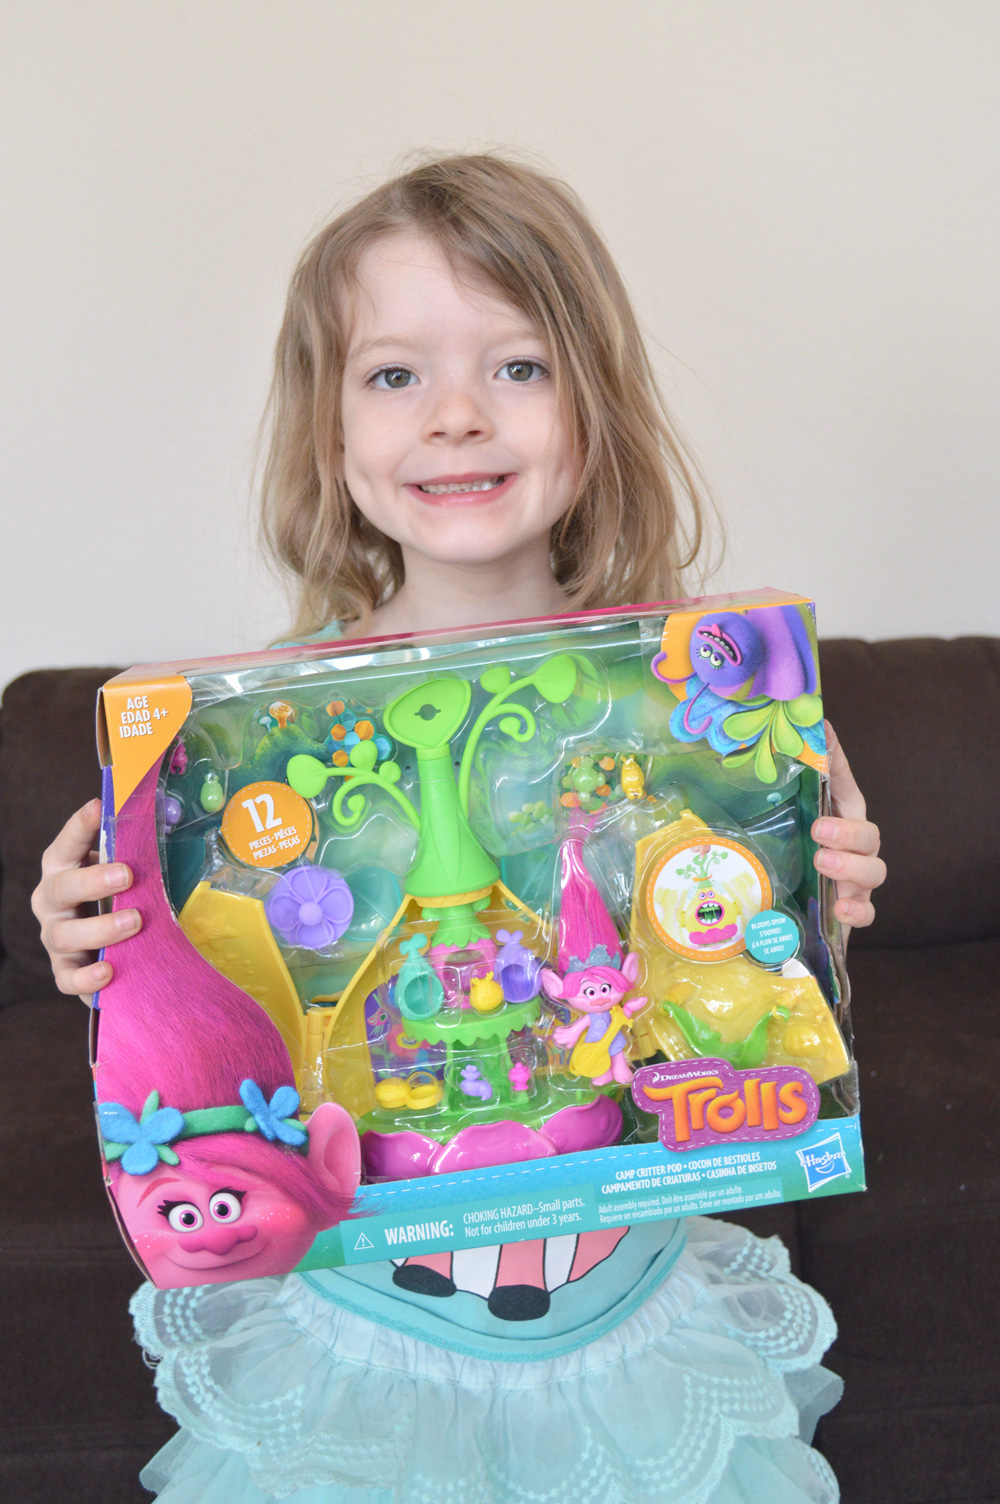 Princess Poppy trolls kids play set